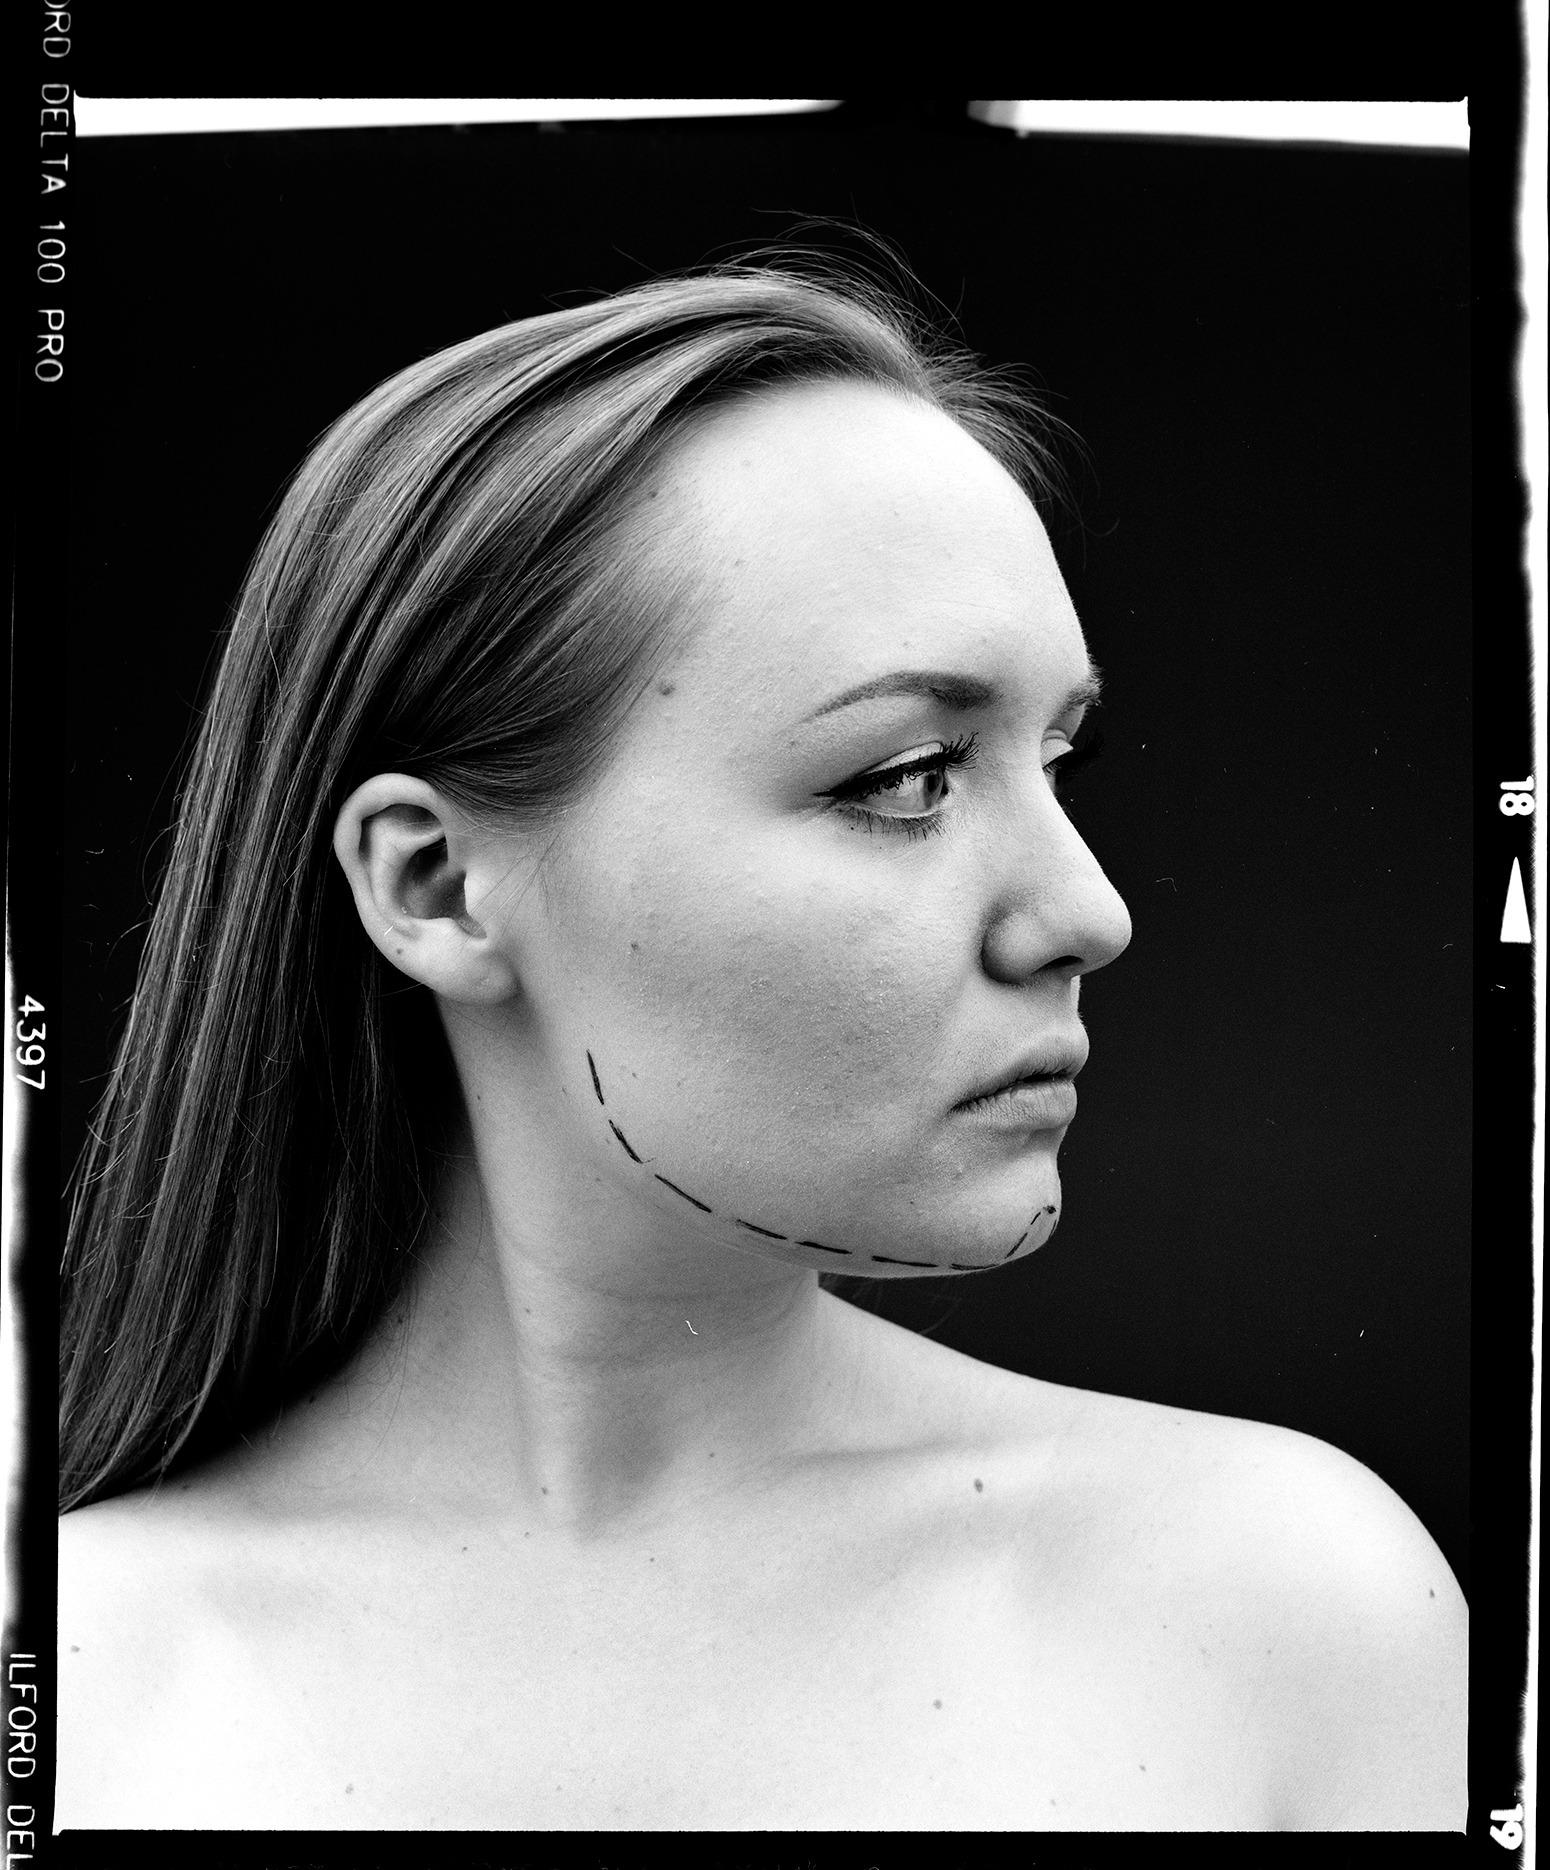 Portraitfotografie straubmuellerstudios Kinn